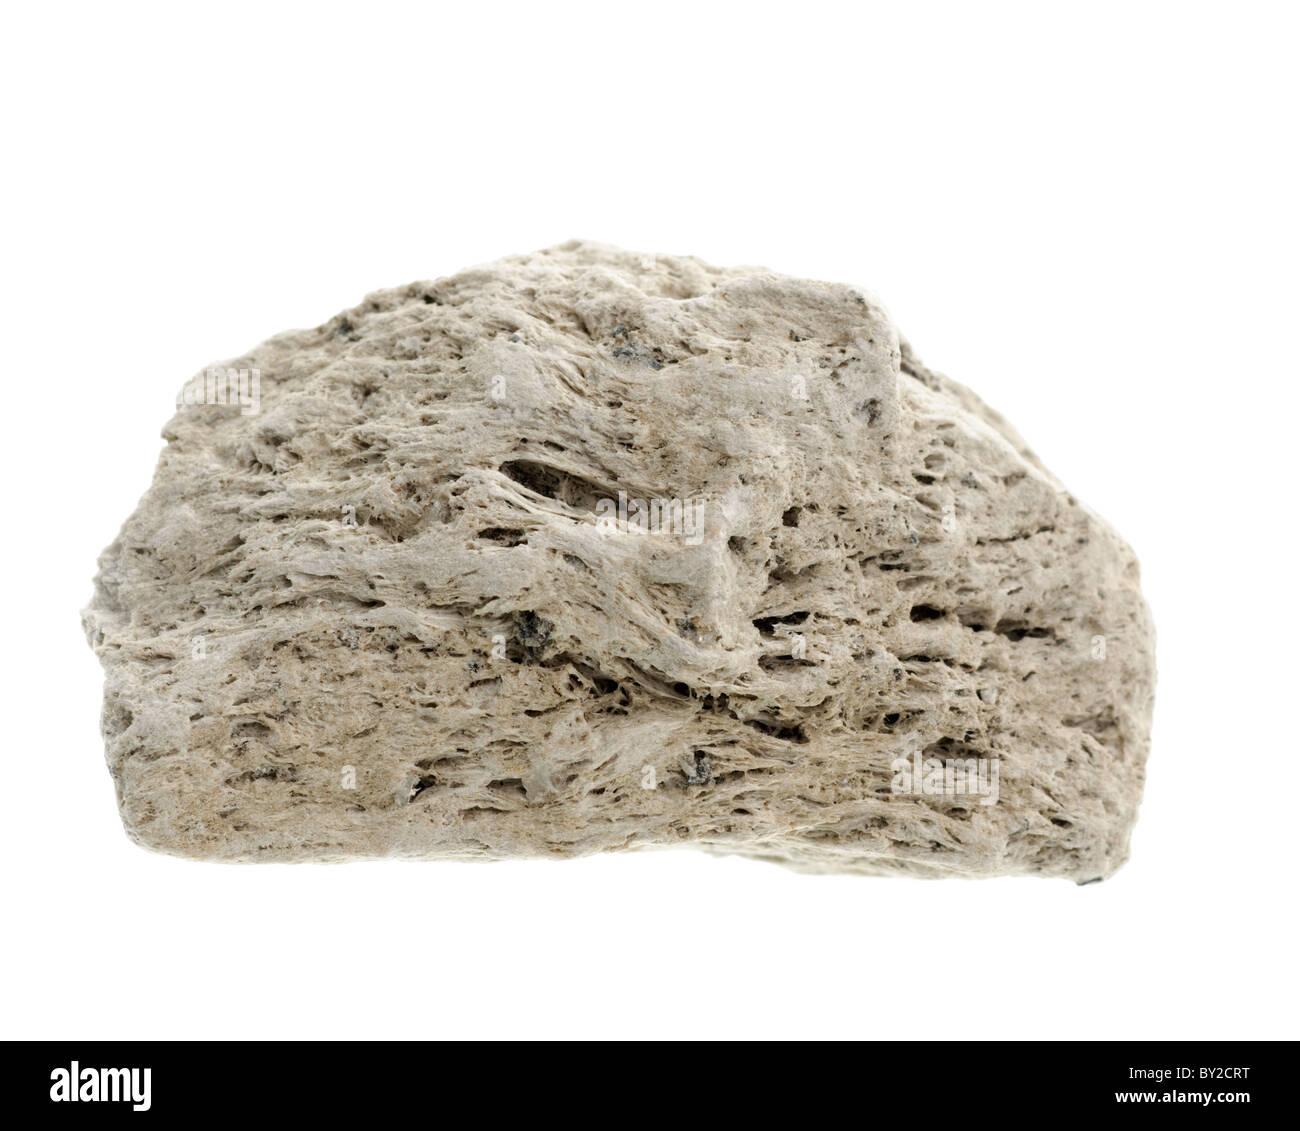 Pumice. Igneous rock sample - Stock Image